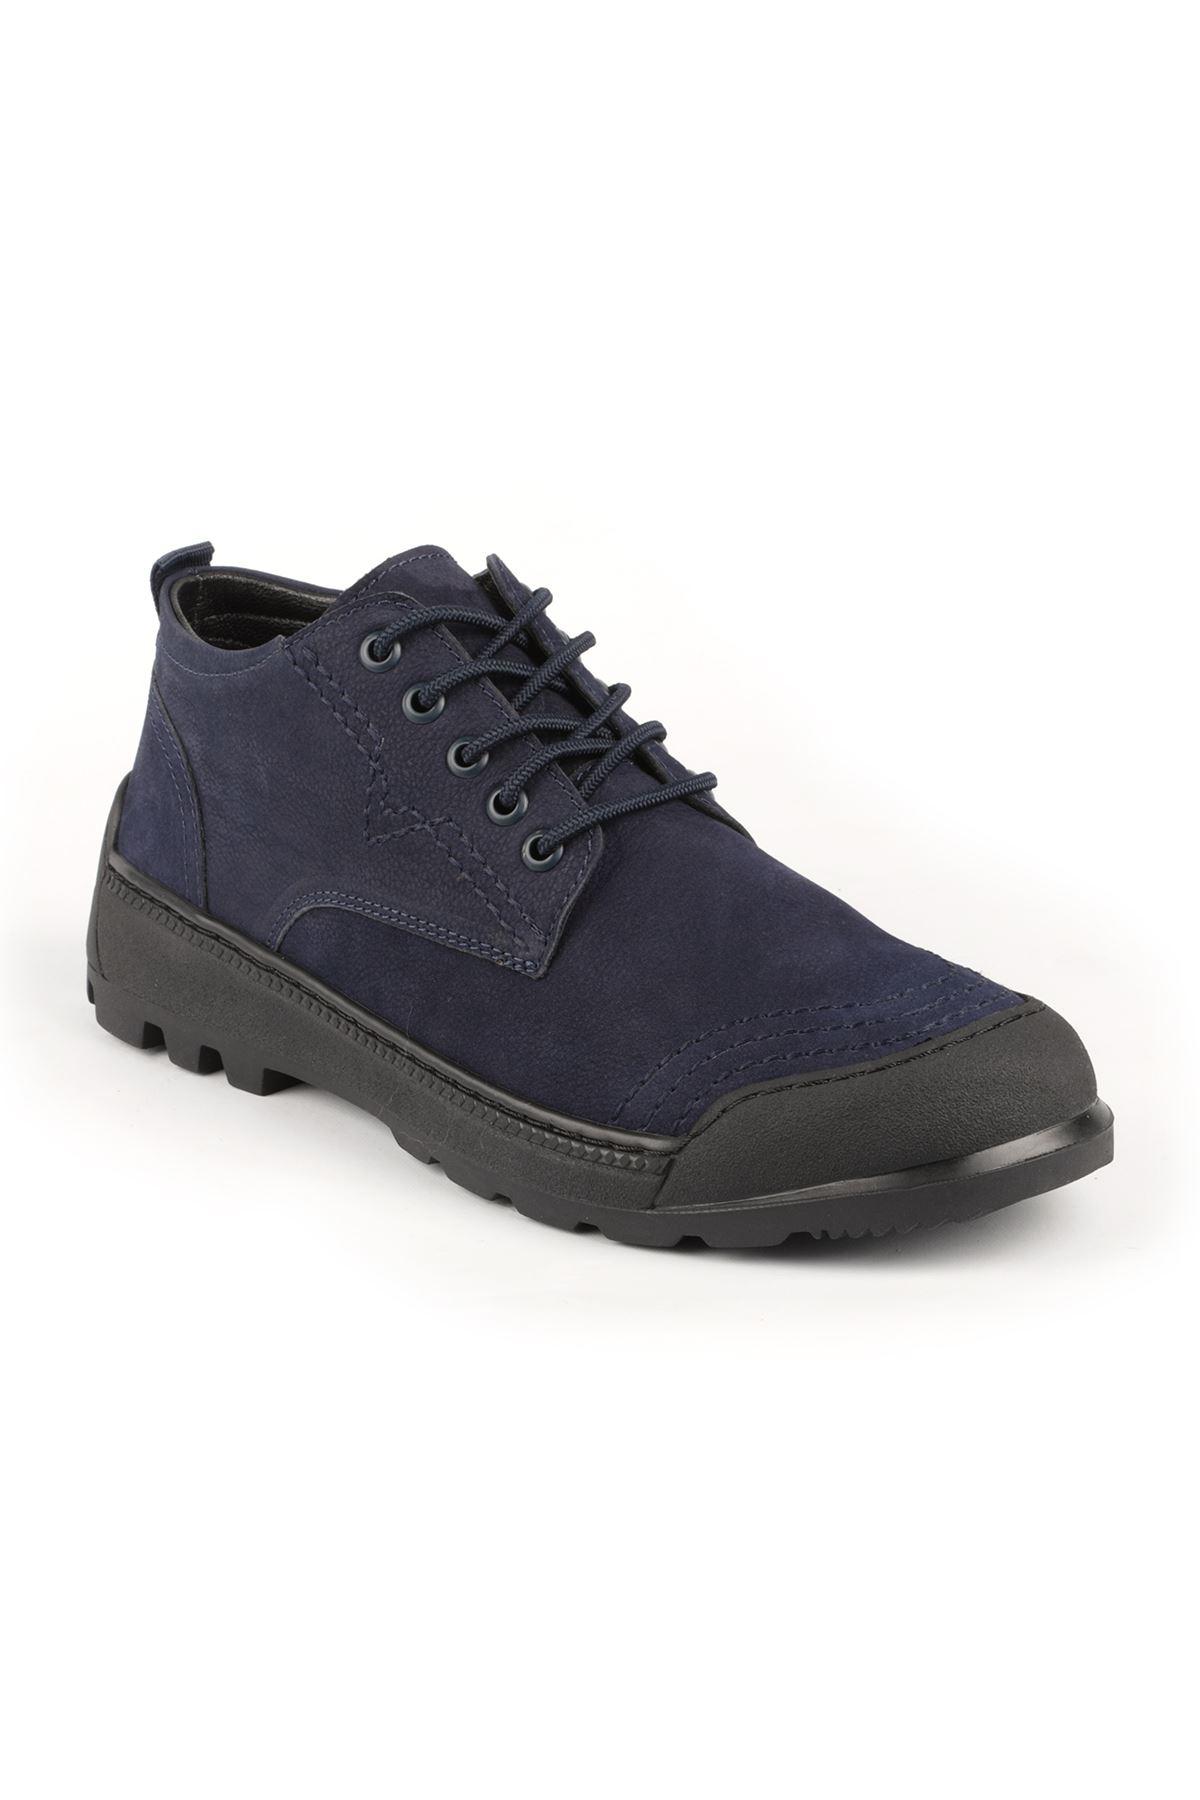 Libero L3485 Lacivert Spor Ayakkabı